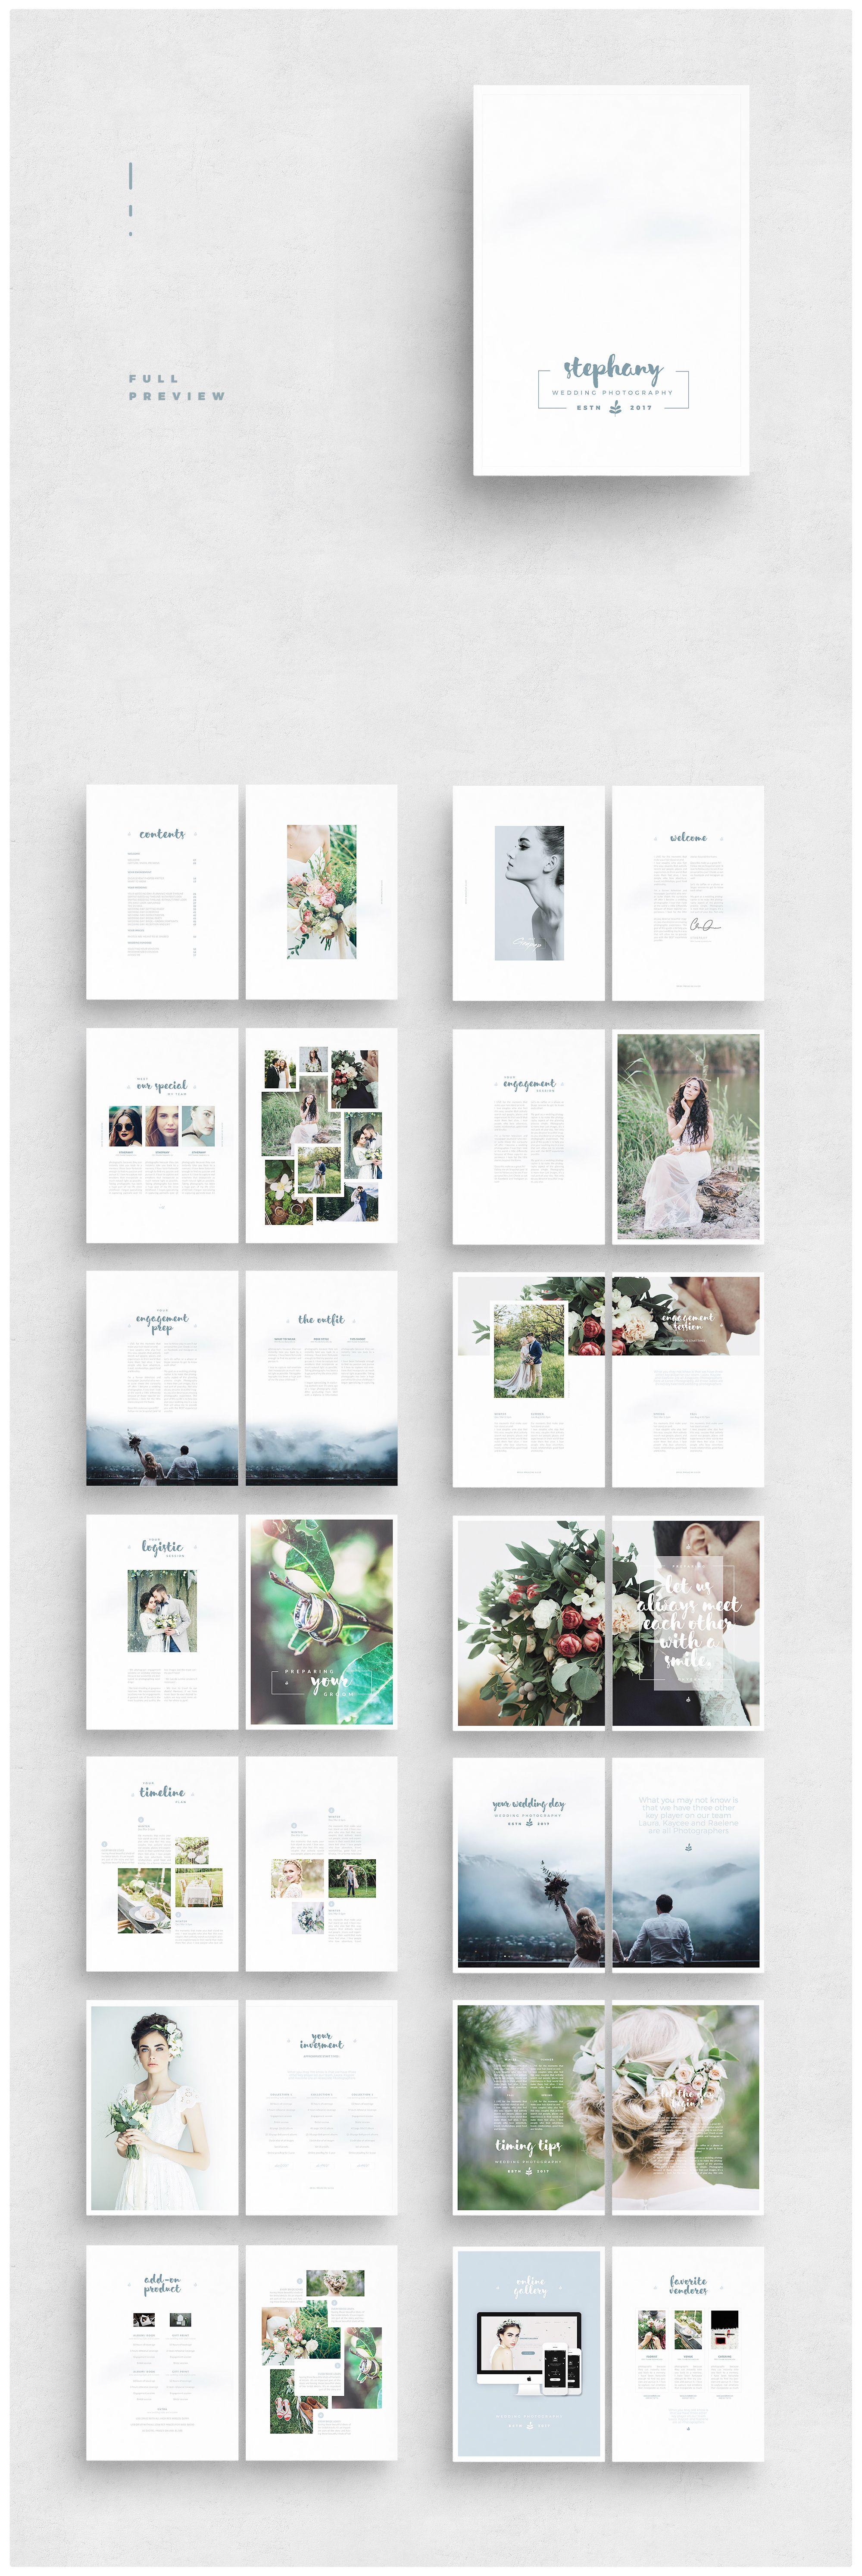 photography photo marketing photographer template marketing wedding